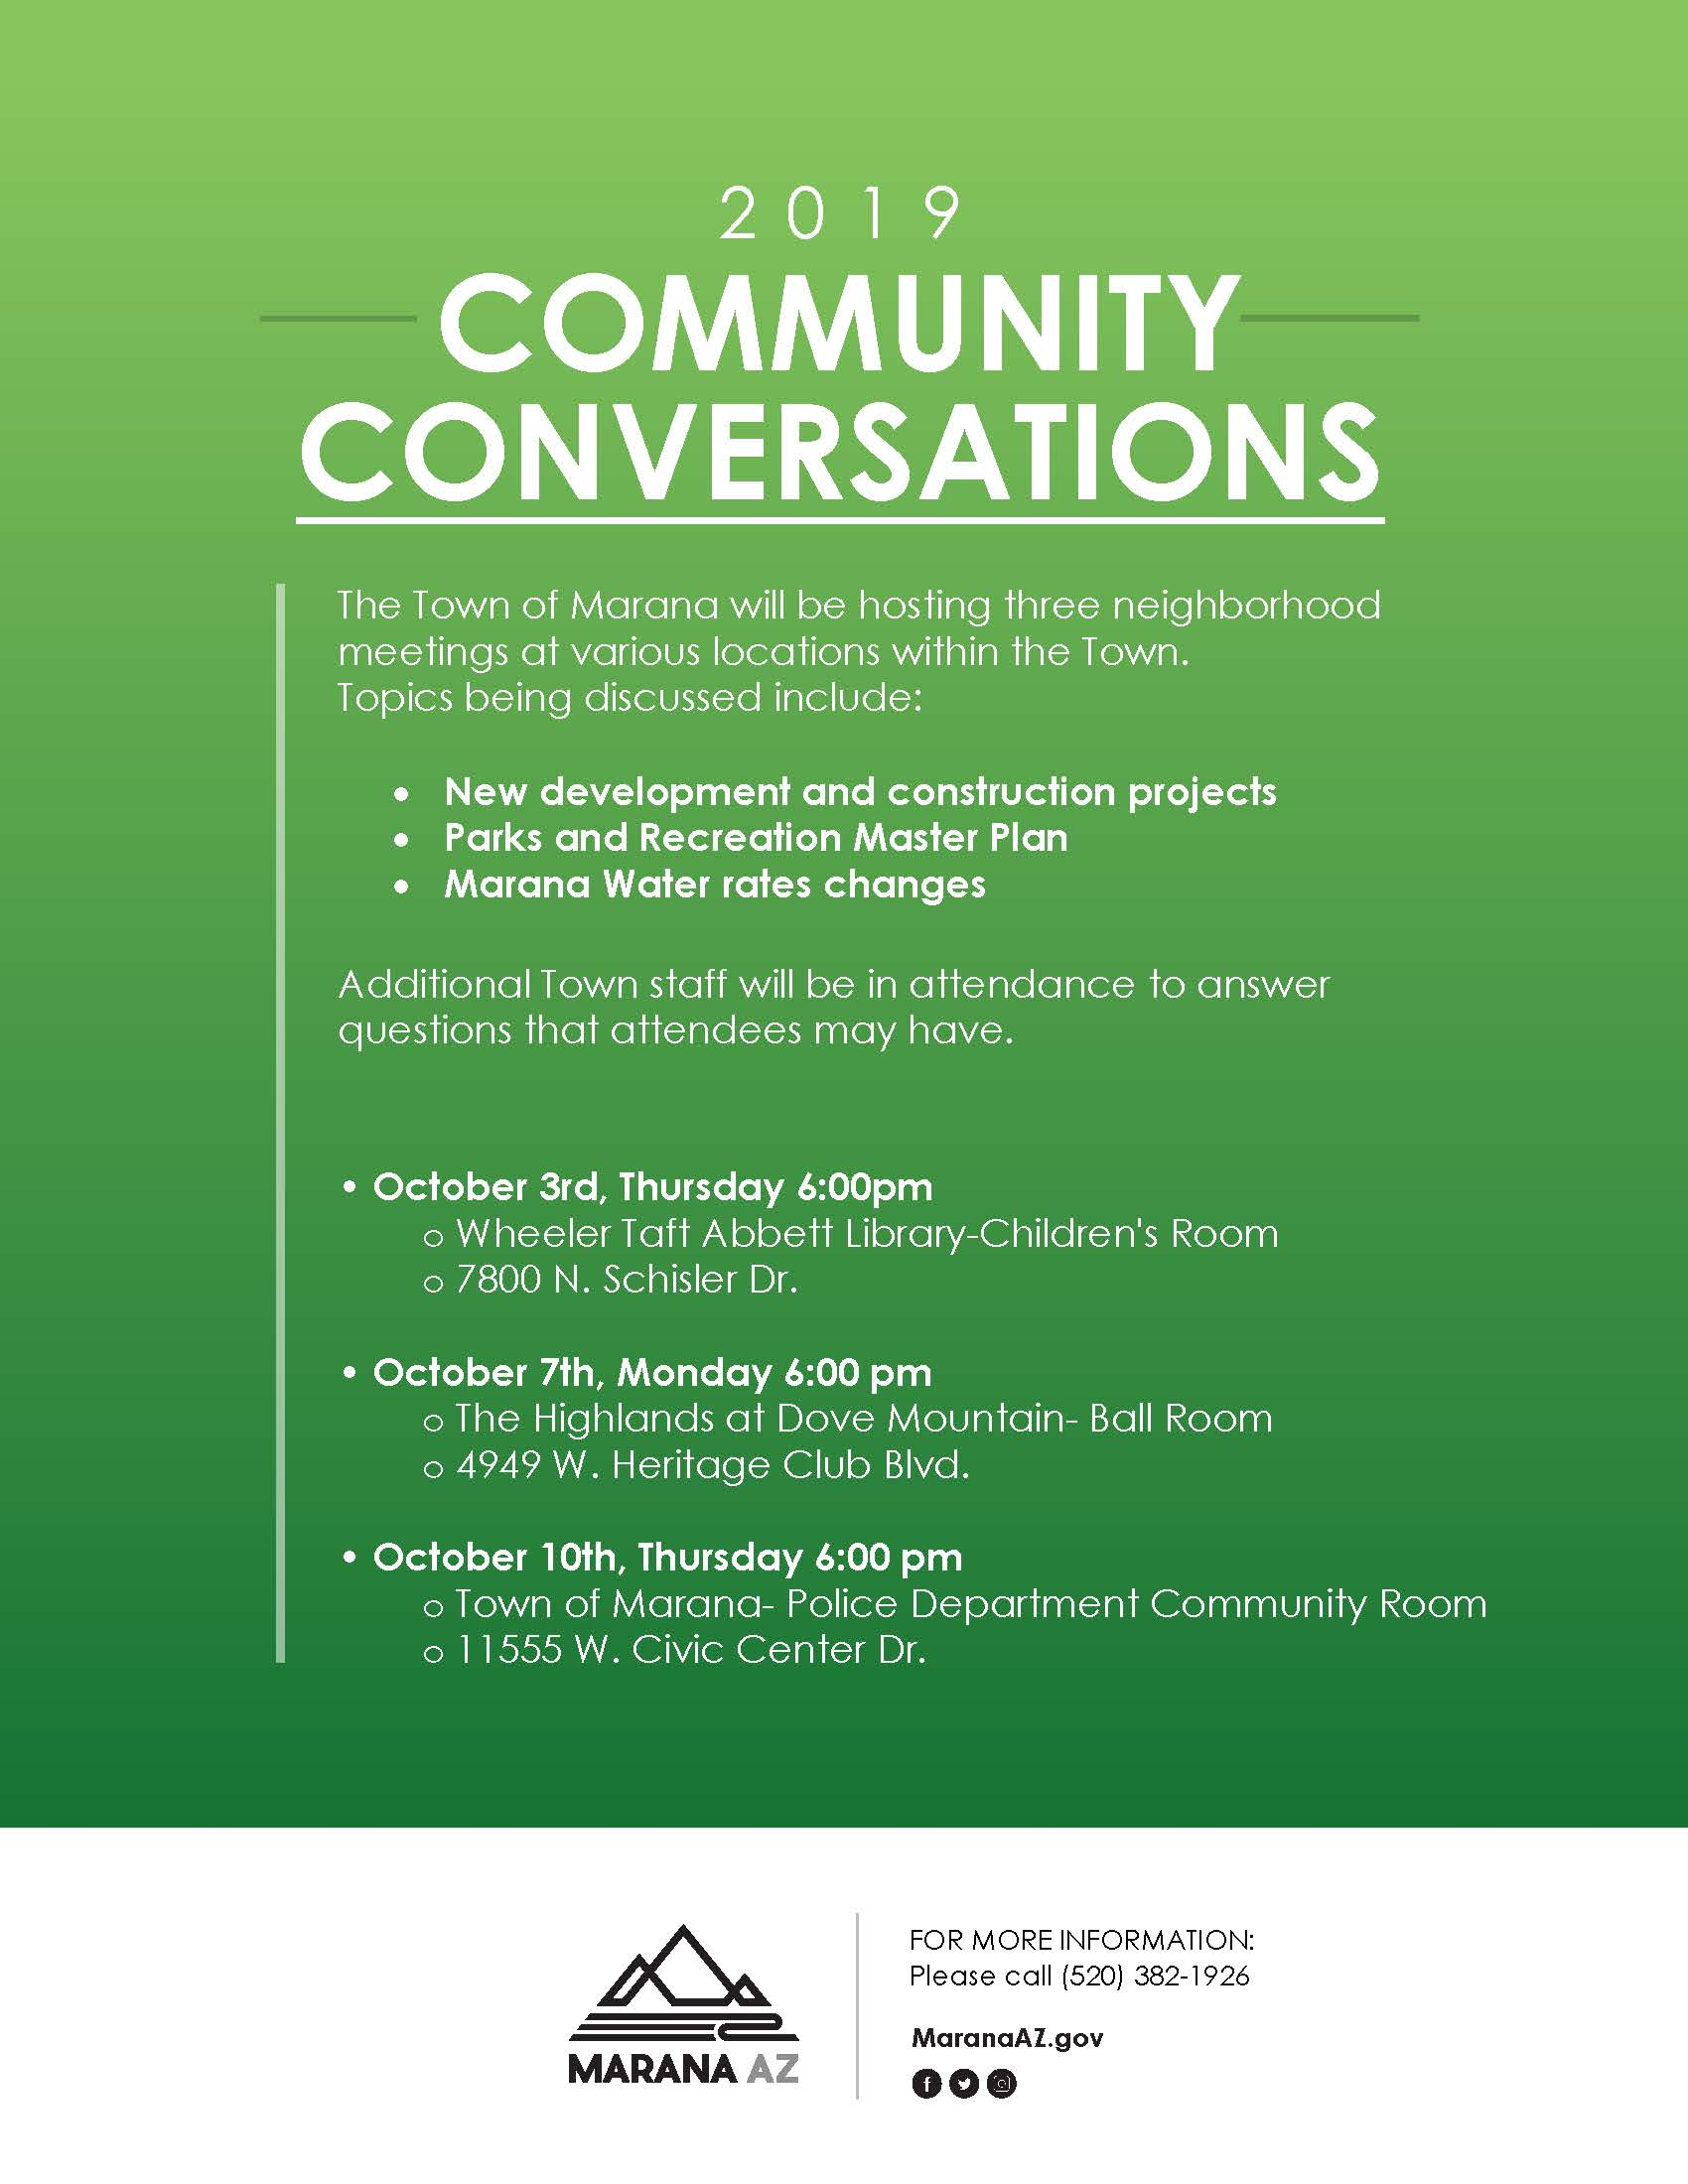 Community Conversations Fall 2019.jpg